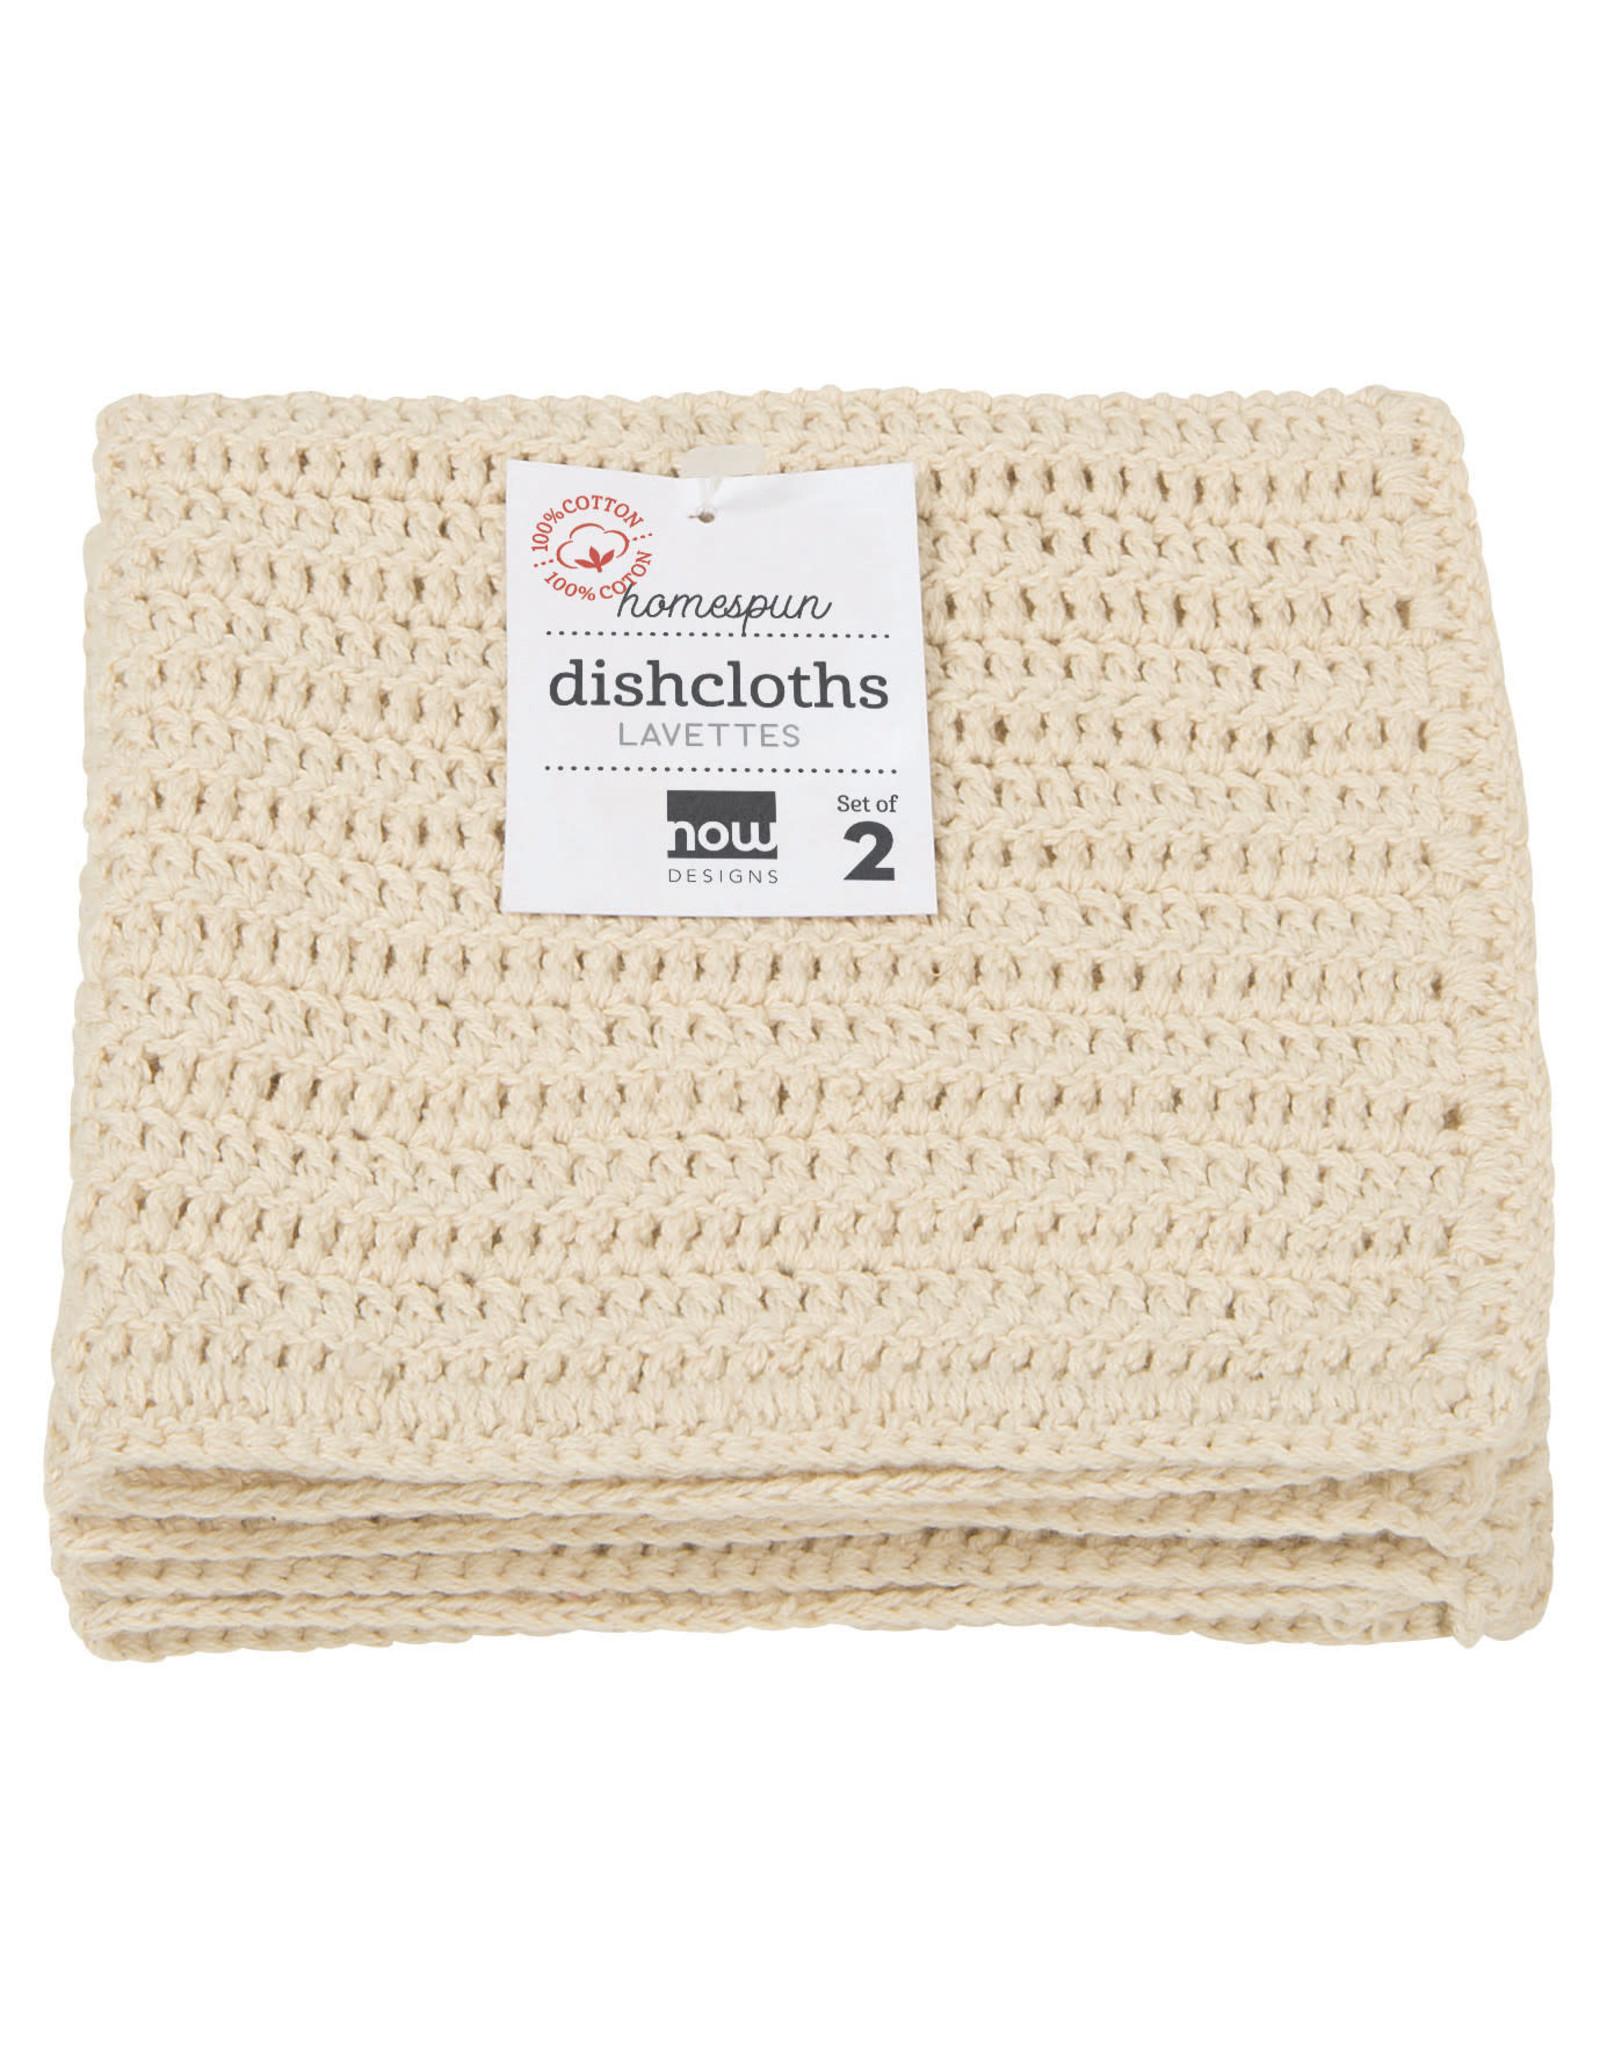 Danica - Homespun Dishcloth - Set/2